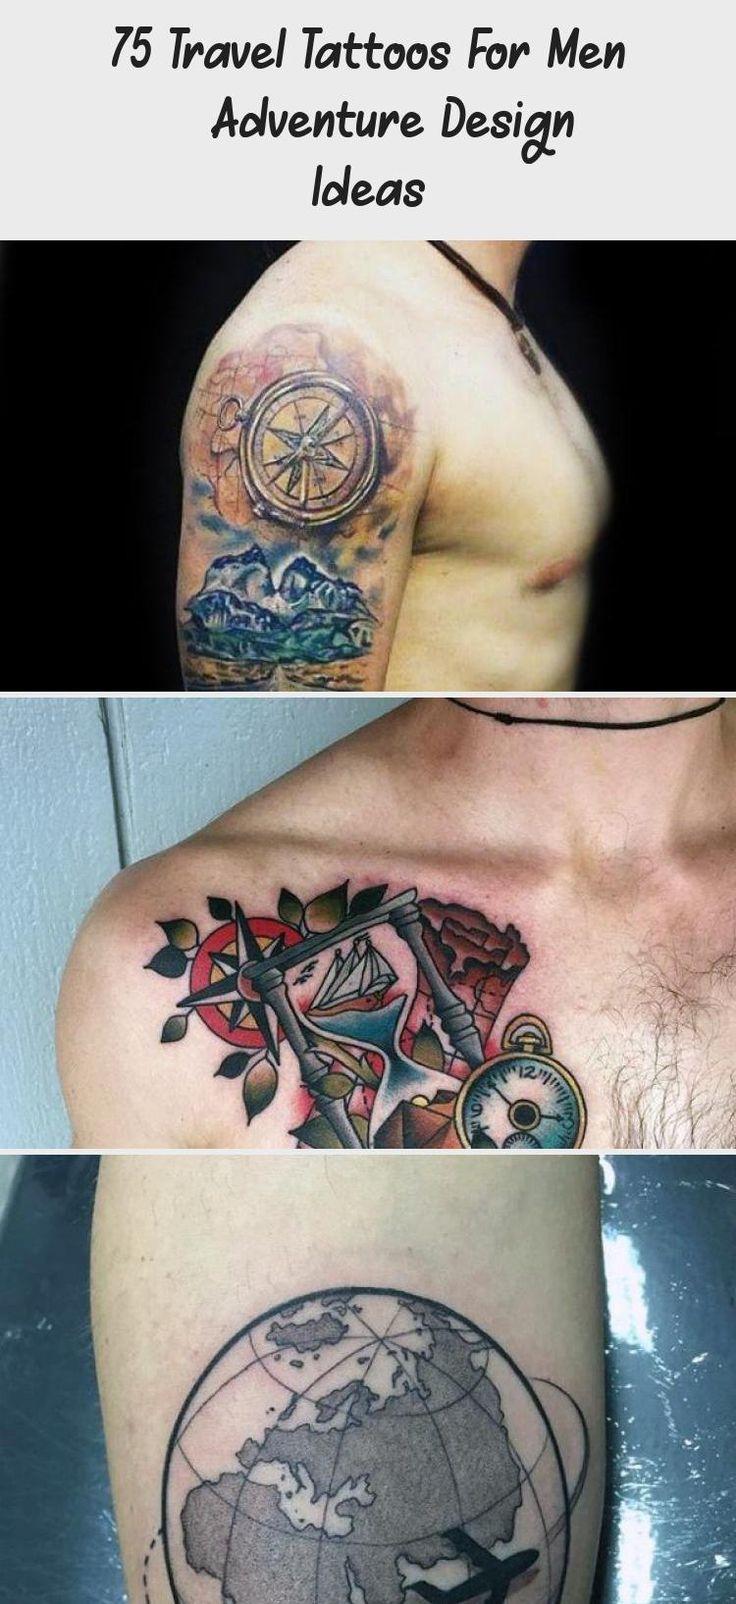 43++ Stunning Travel tattoo ideas for guys image HD